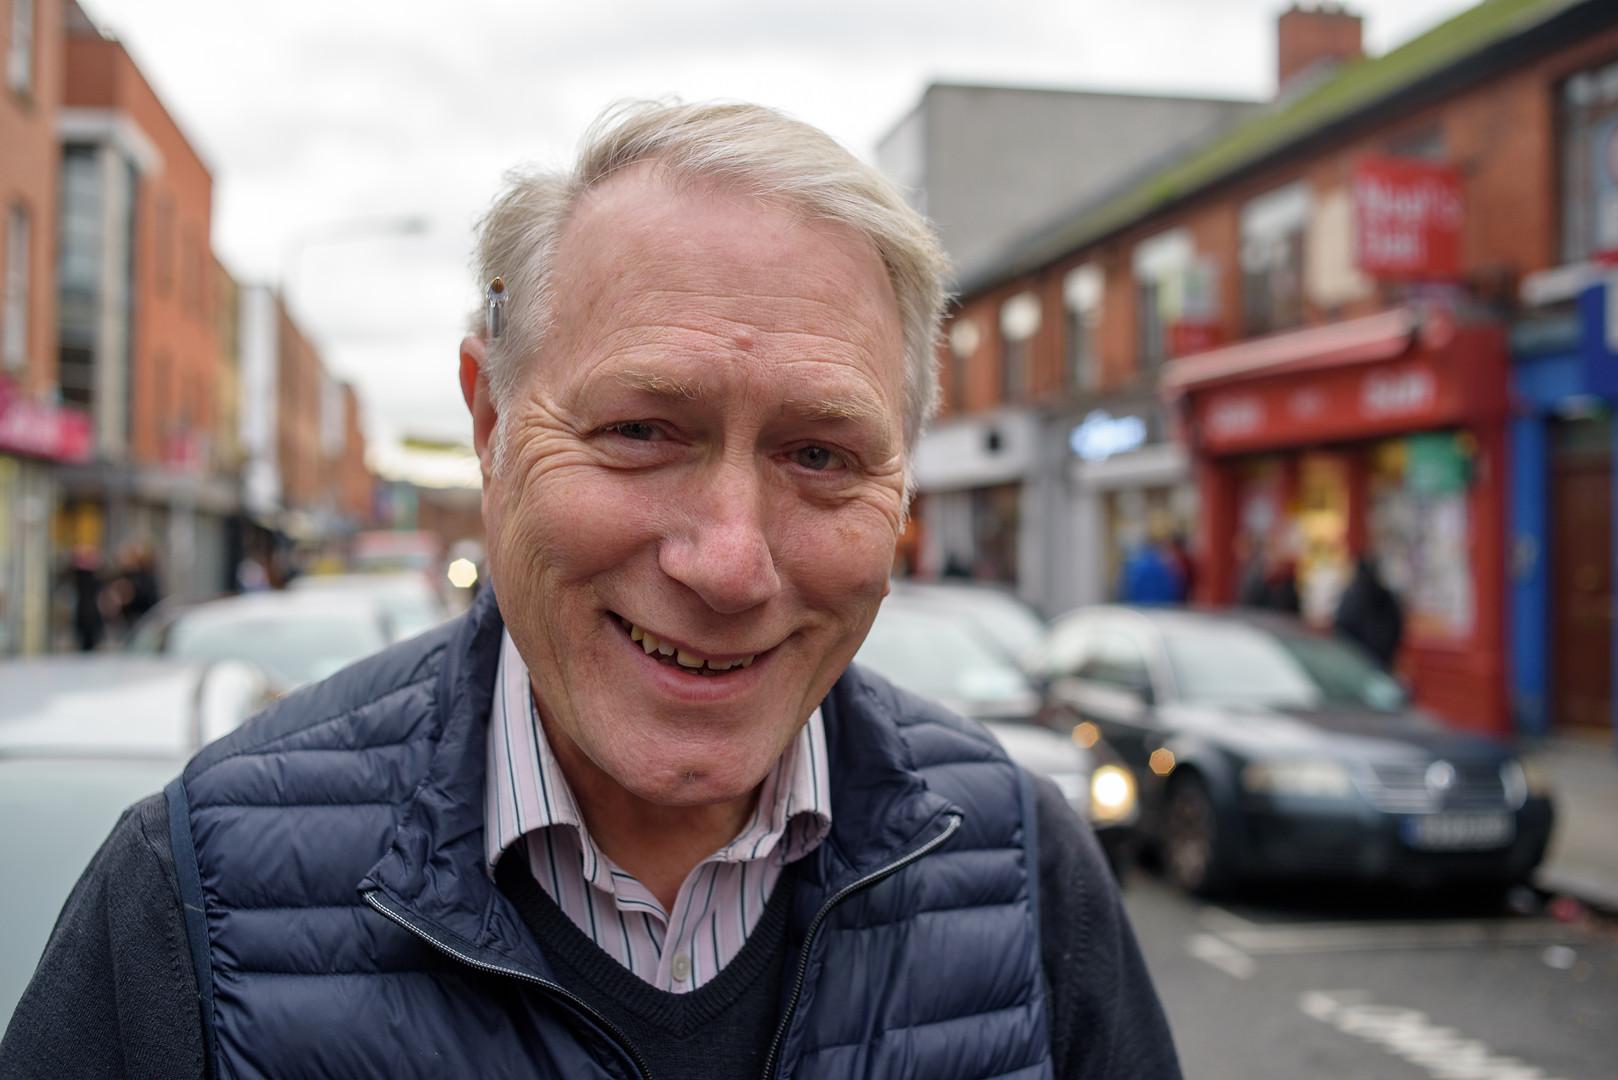 Noel Fleming, Owner of Noel's Deli